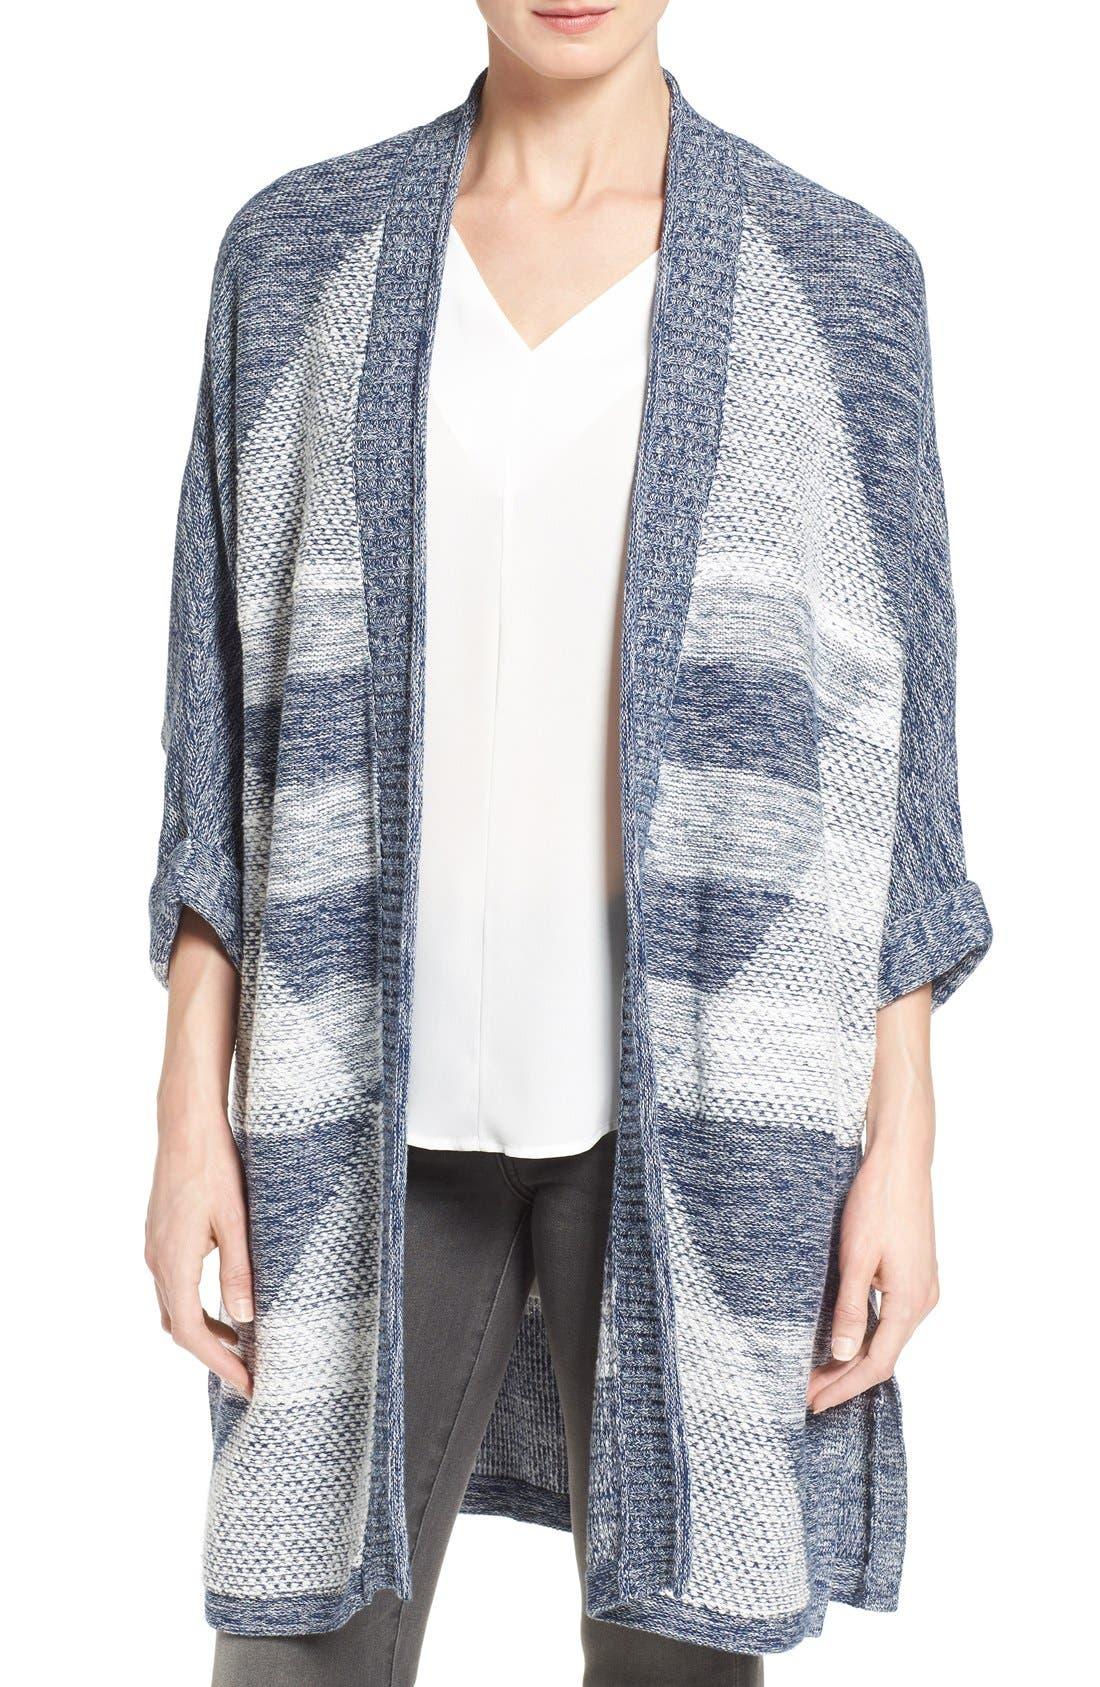 Alternate Image 1 Selected - Caslon® Cuffed Sleeve Long Cardigan